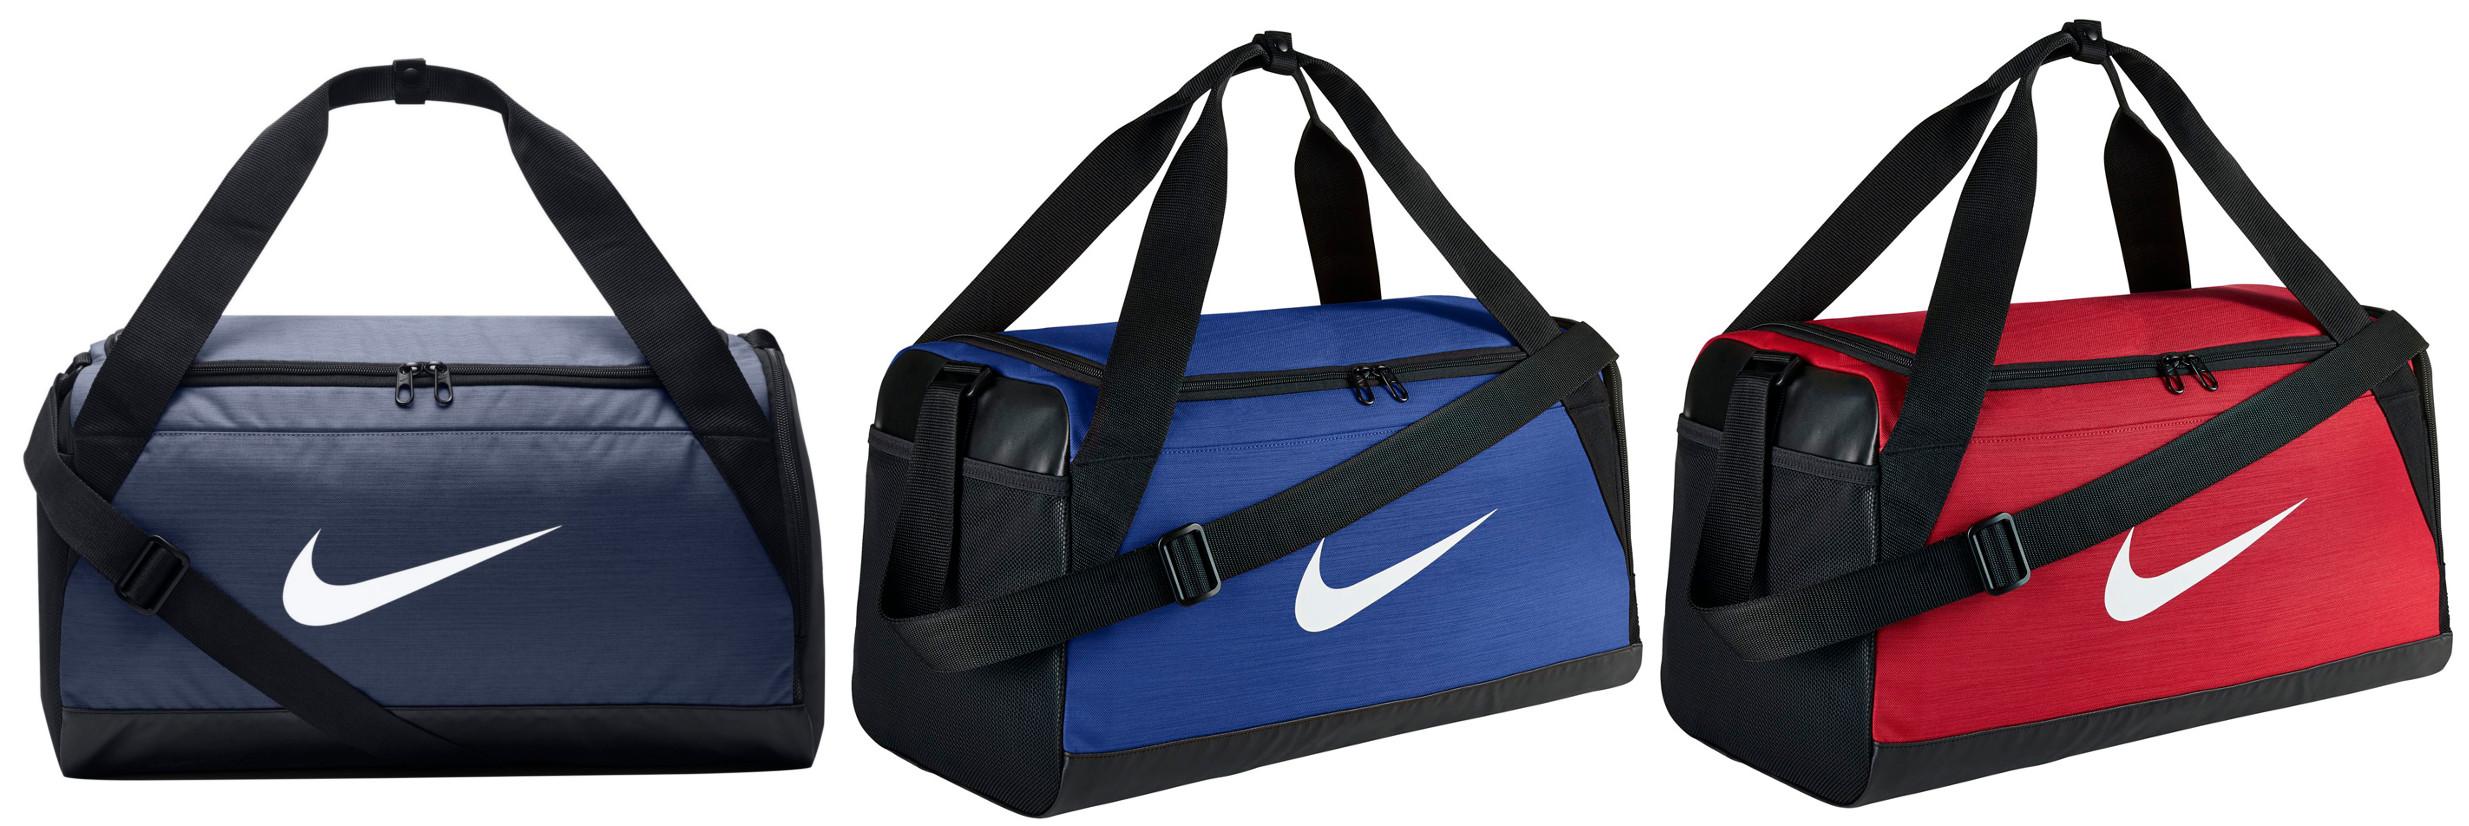 530b77955 Nike Brasilia 6 Training Duffle S BA5335 043 :: Рюкзаки, спортивные ...